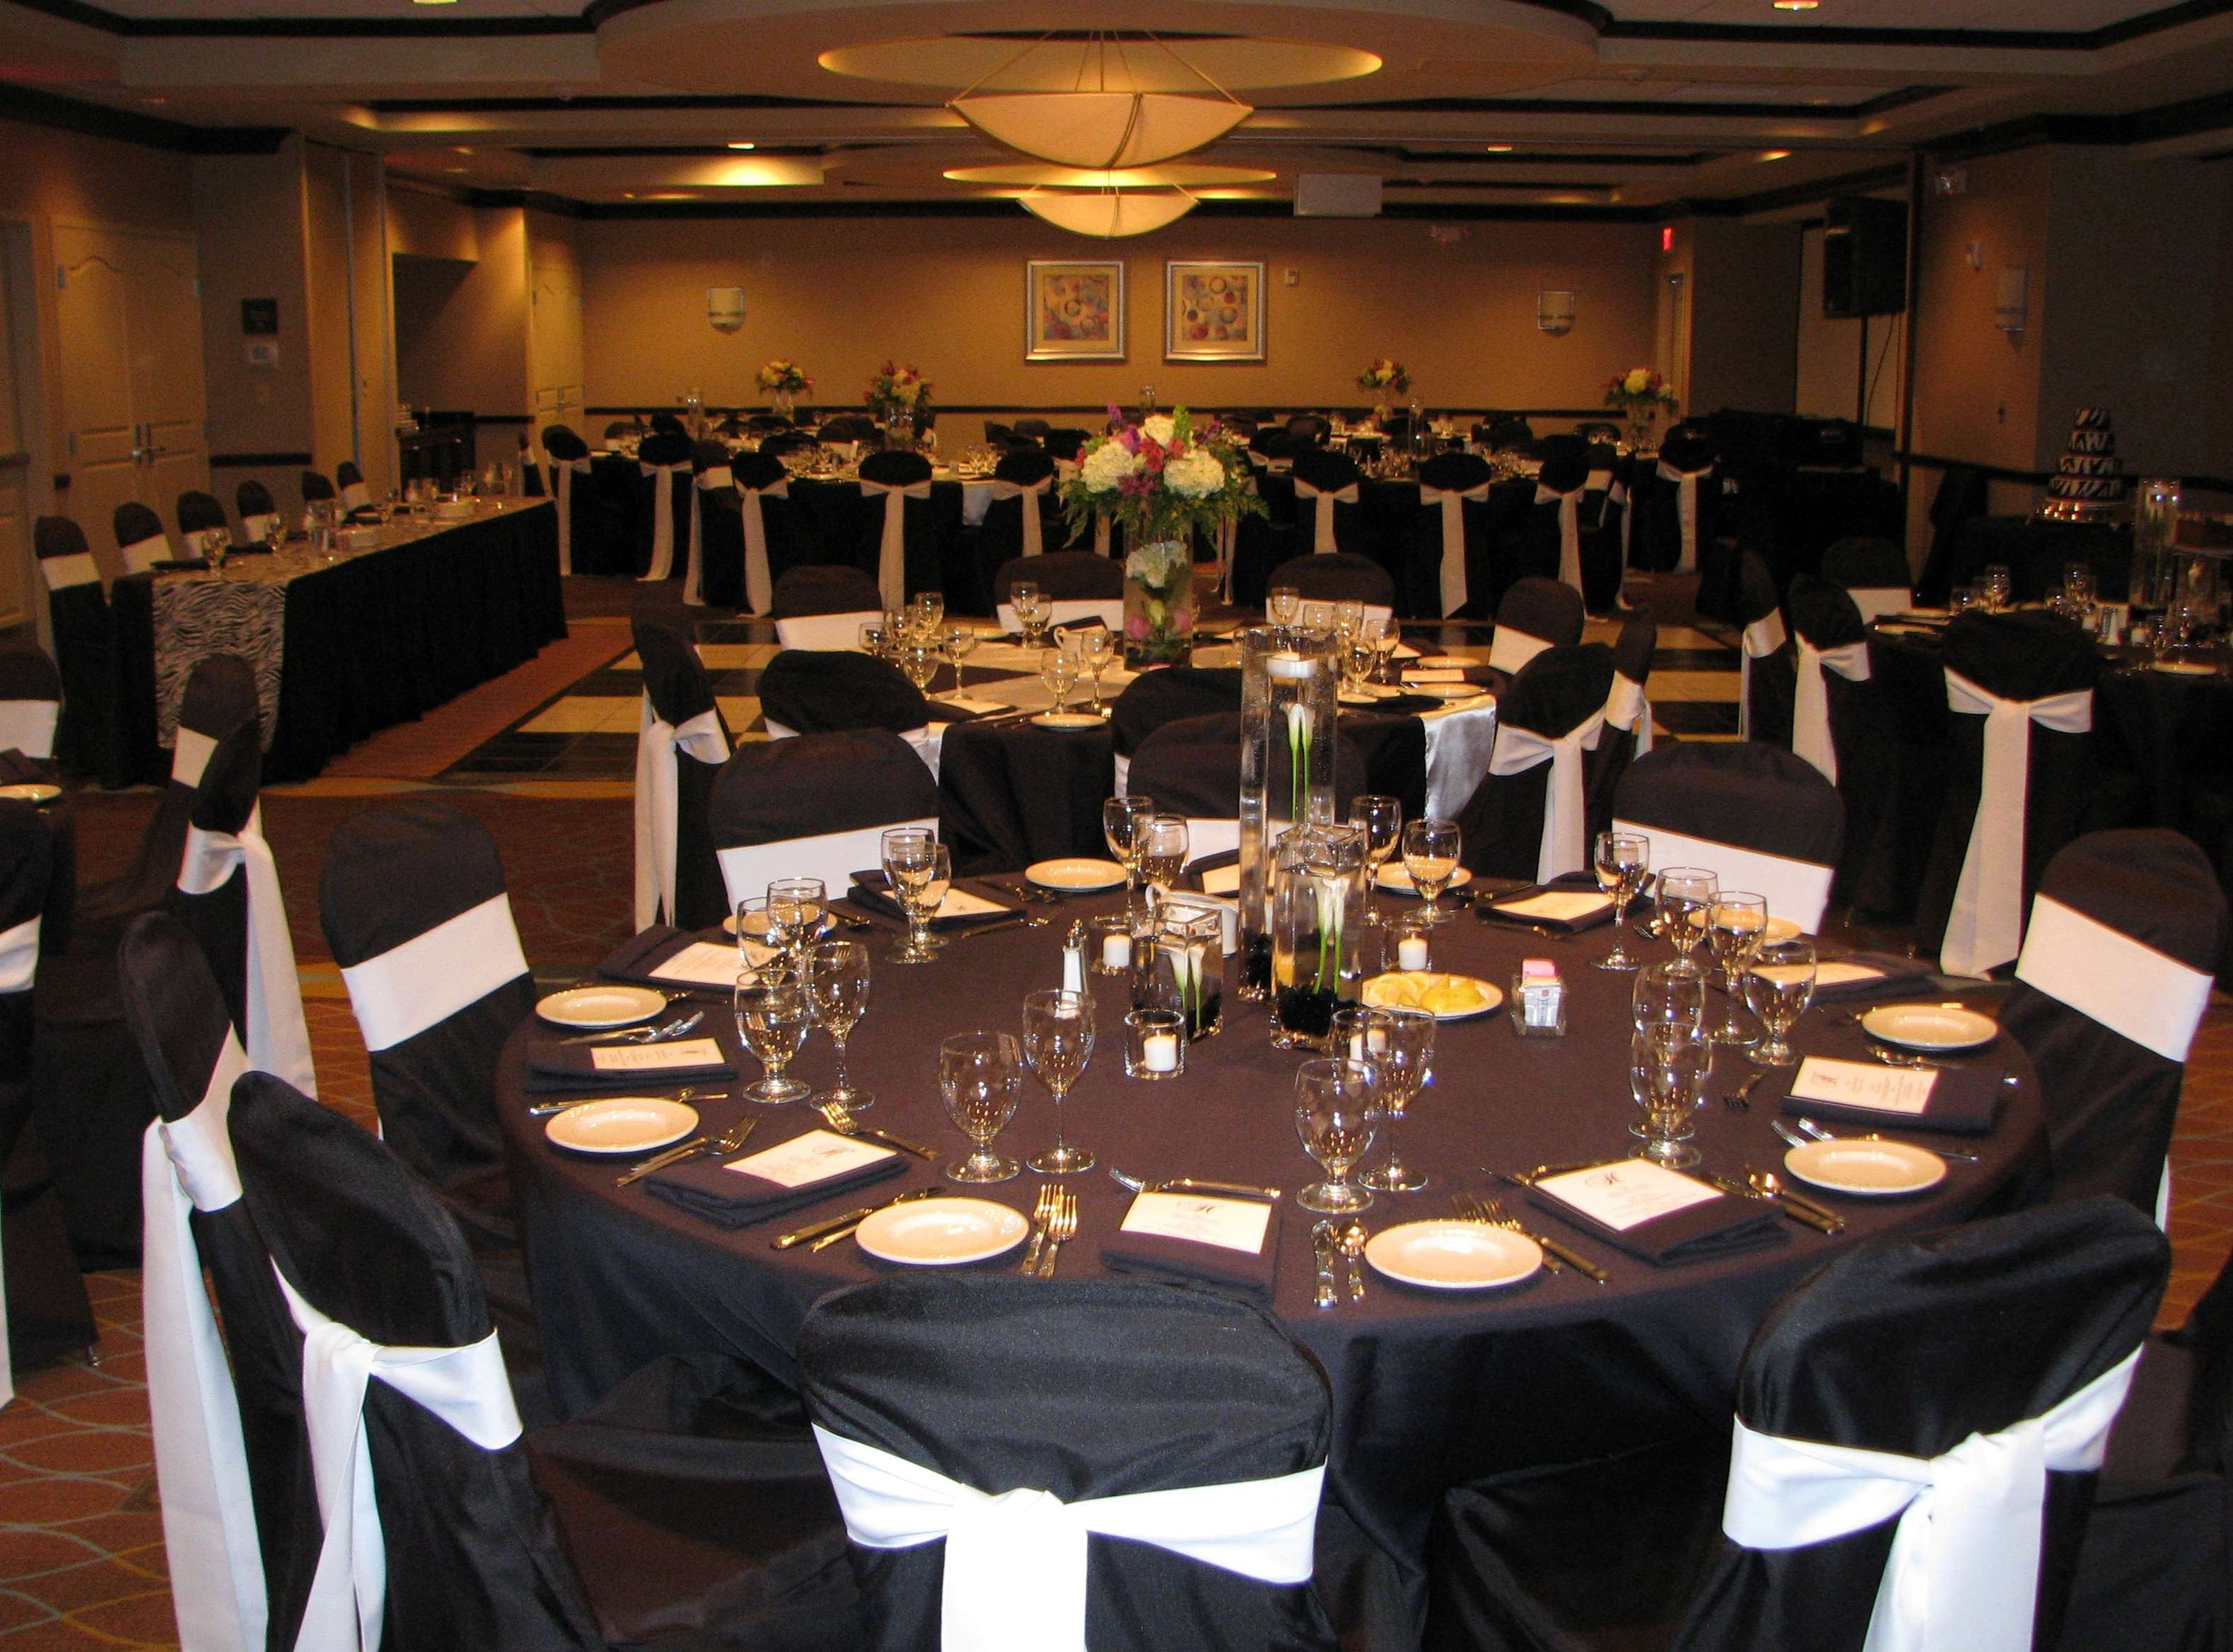 Hilton Garden Inn Clarksville image 48